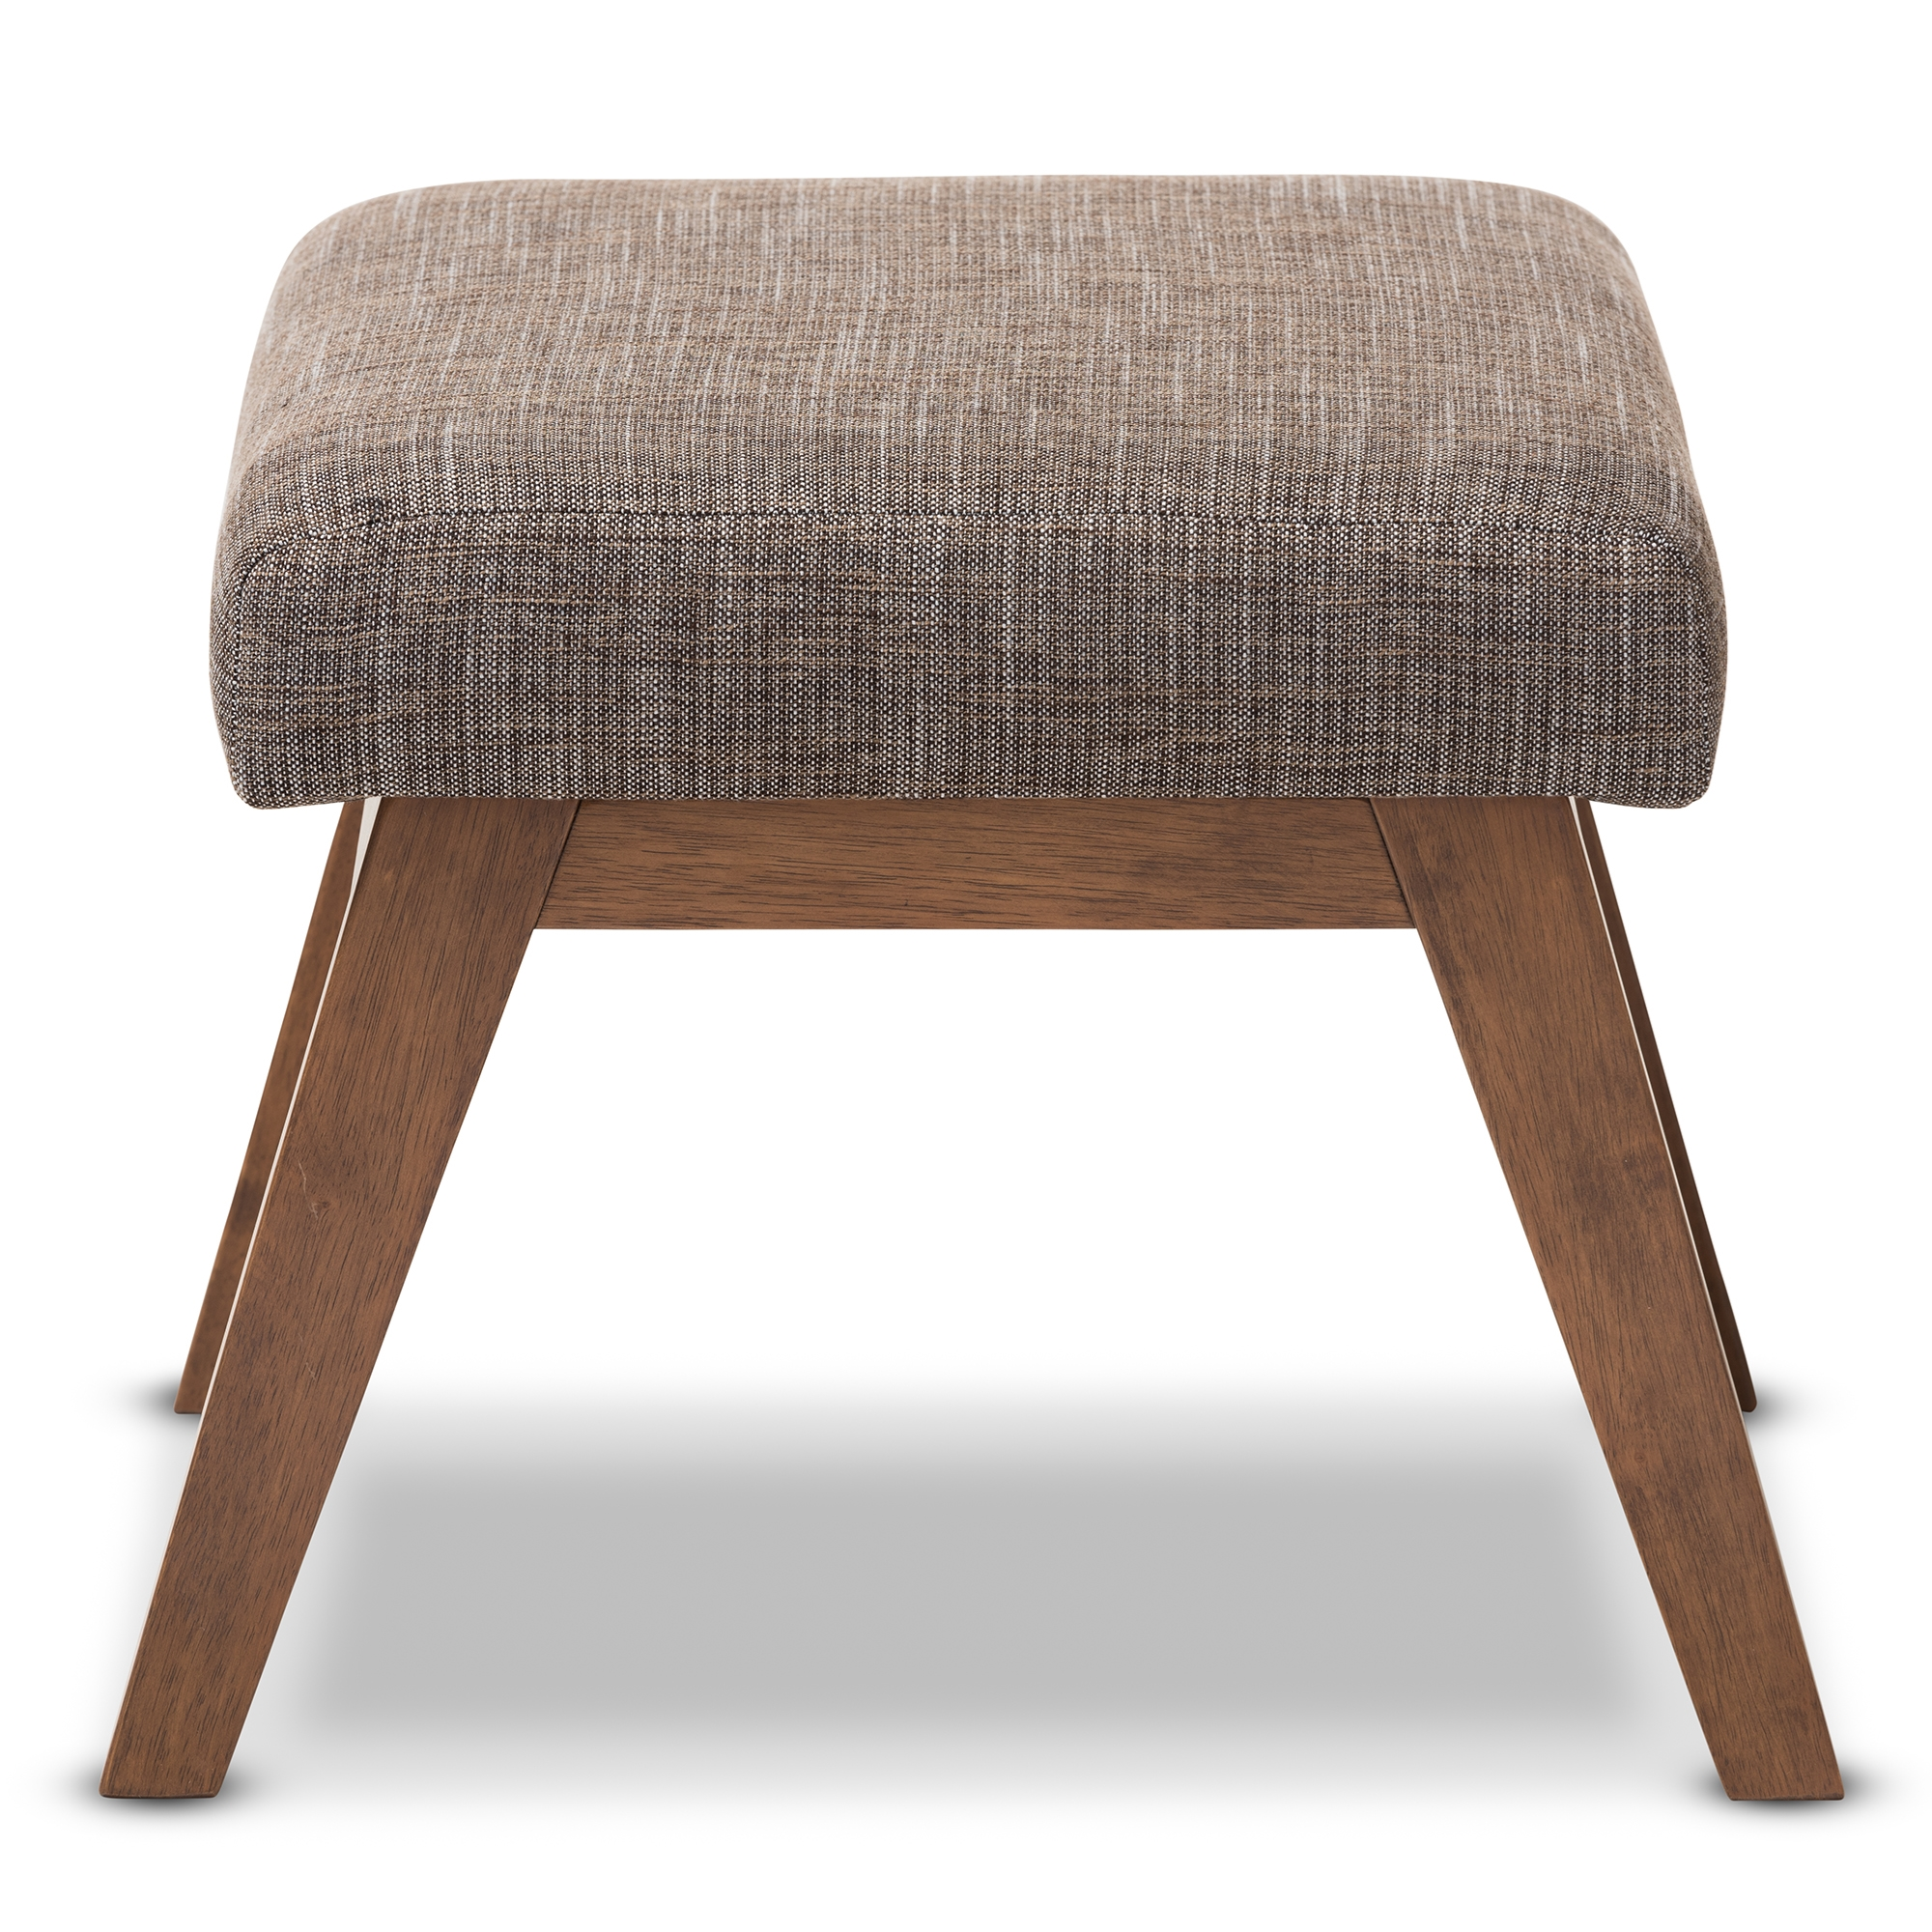 baxton studio aberdeen midcentury modern walnut wood finishing and gravel fabric upholstered ottoman - Upholstered Ottoman